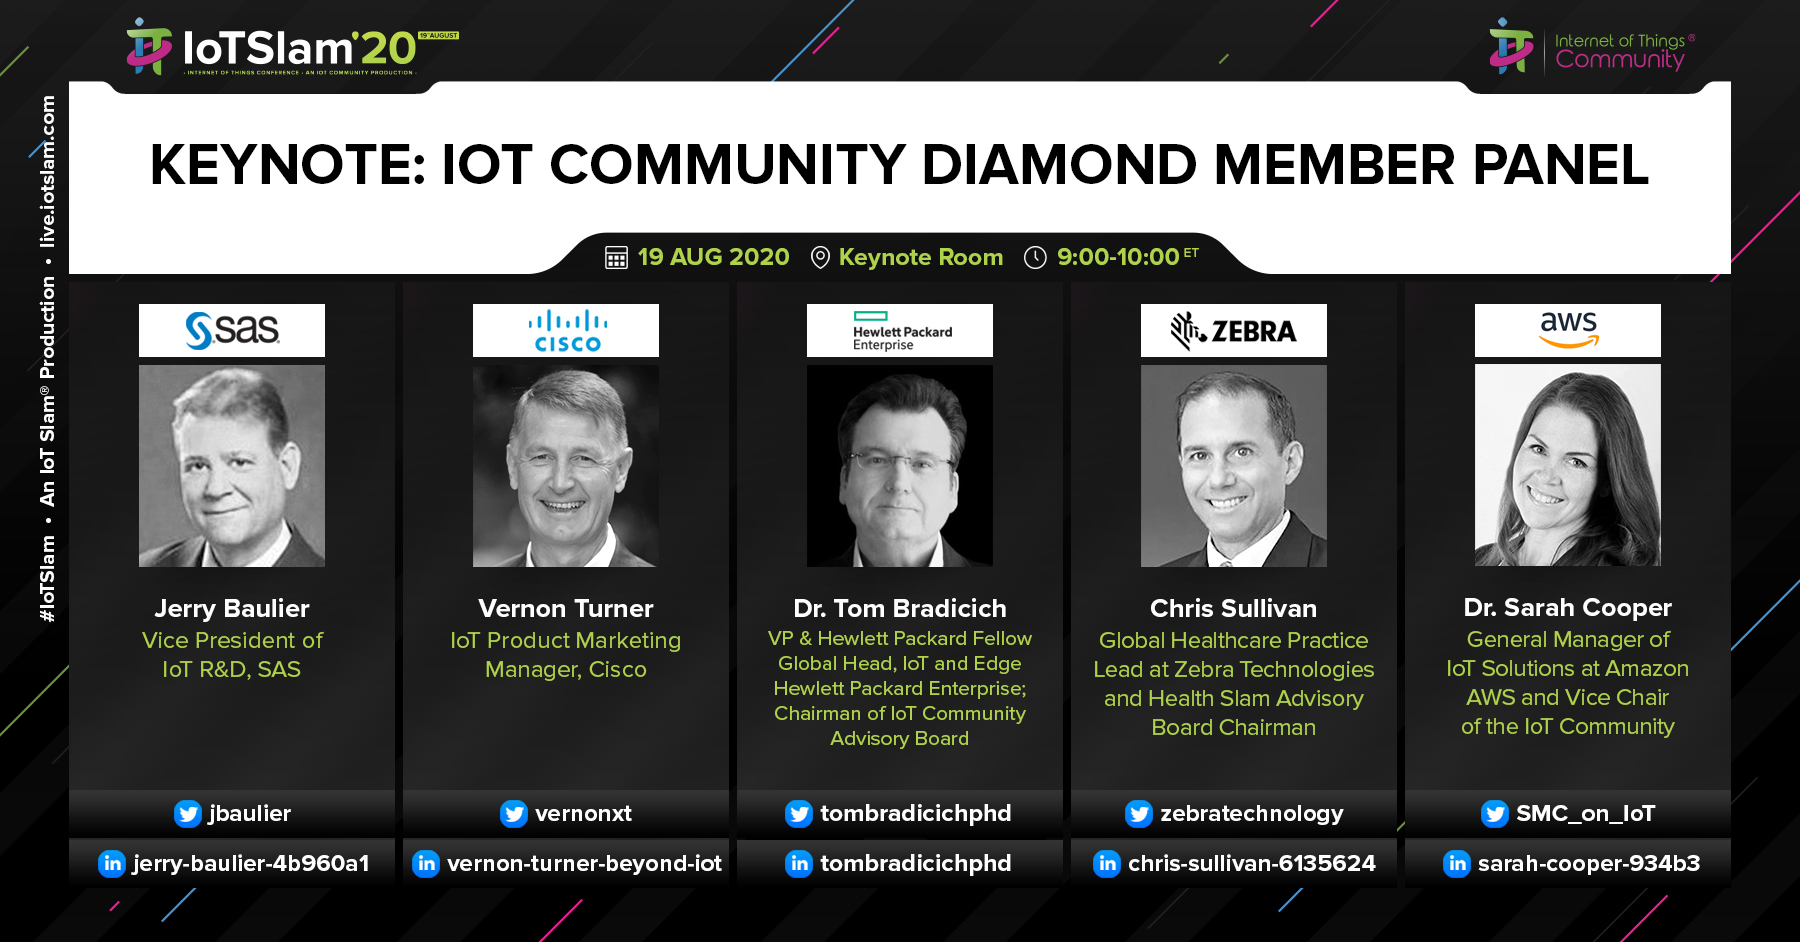 IoT Slam 2020 Opening Keynote and Diamond Member Panel